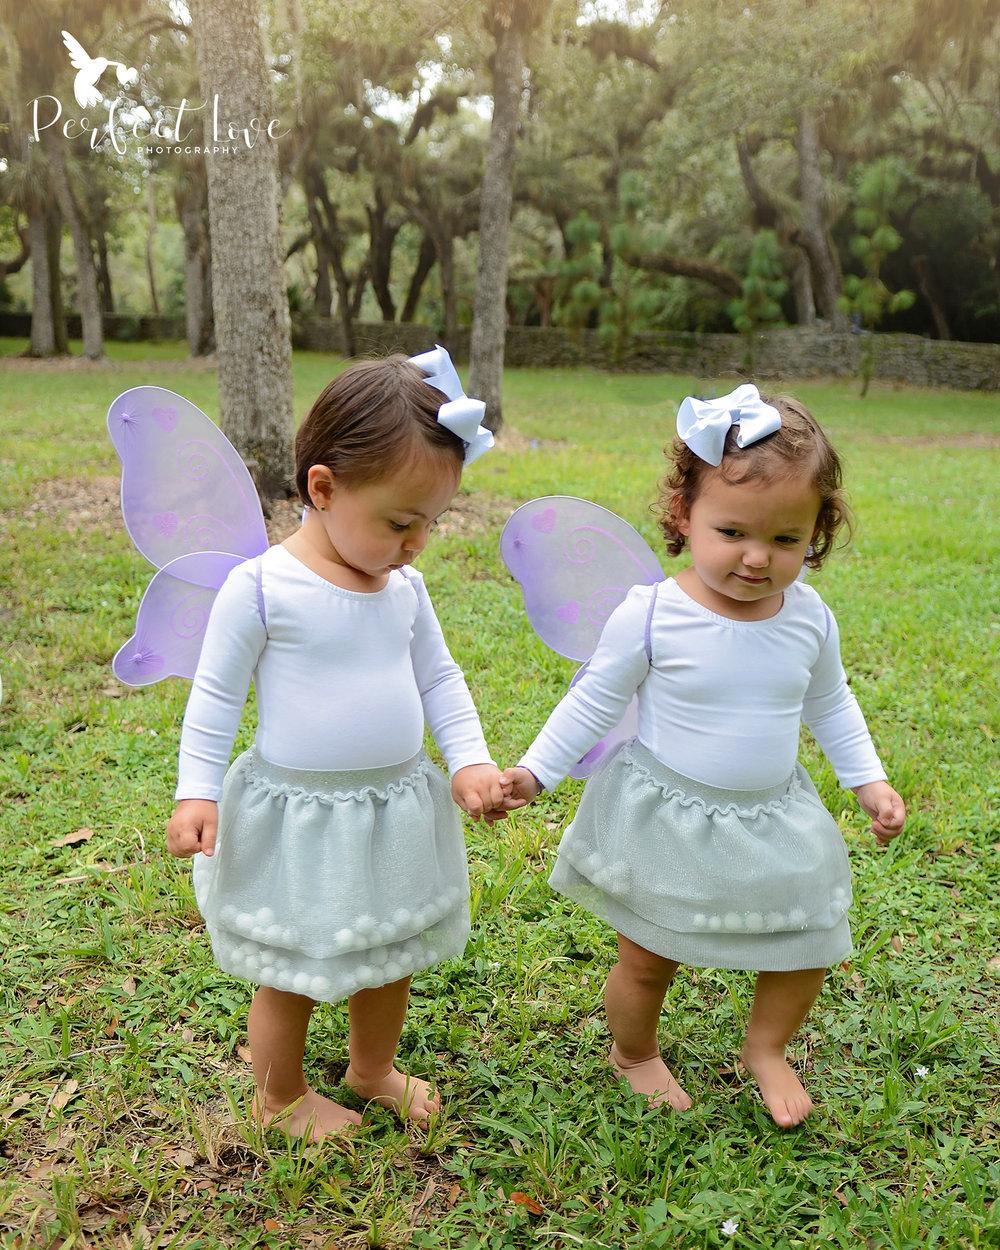 PLP_6352 edited fb.jpg